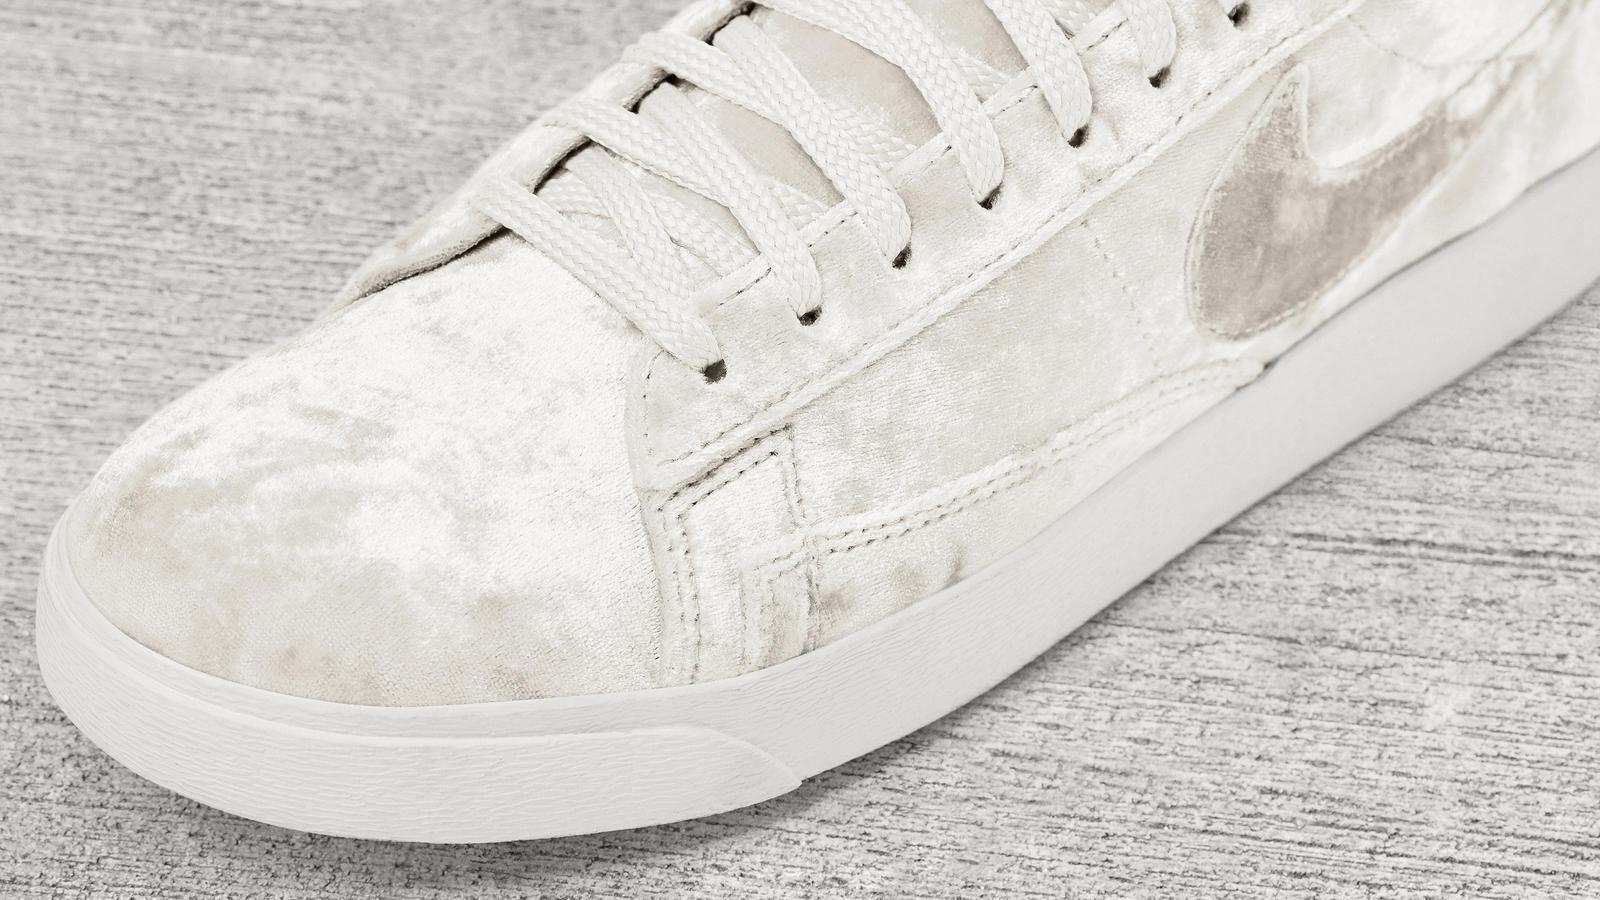 separation shoes c4663 615ce Nike Blazer Low LX - Nike News